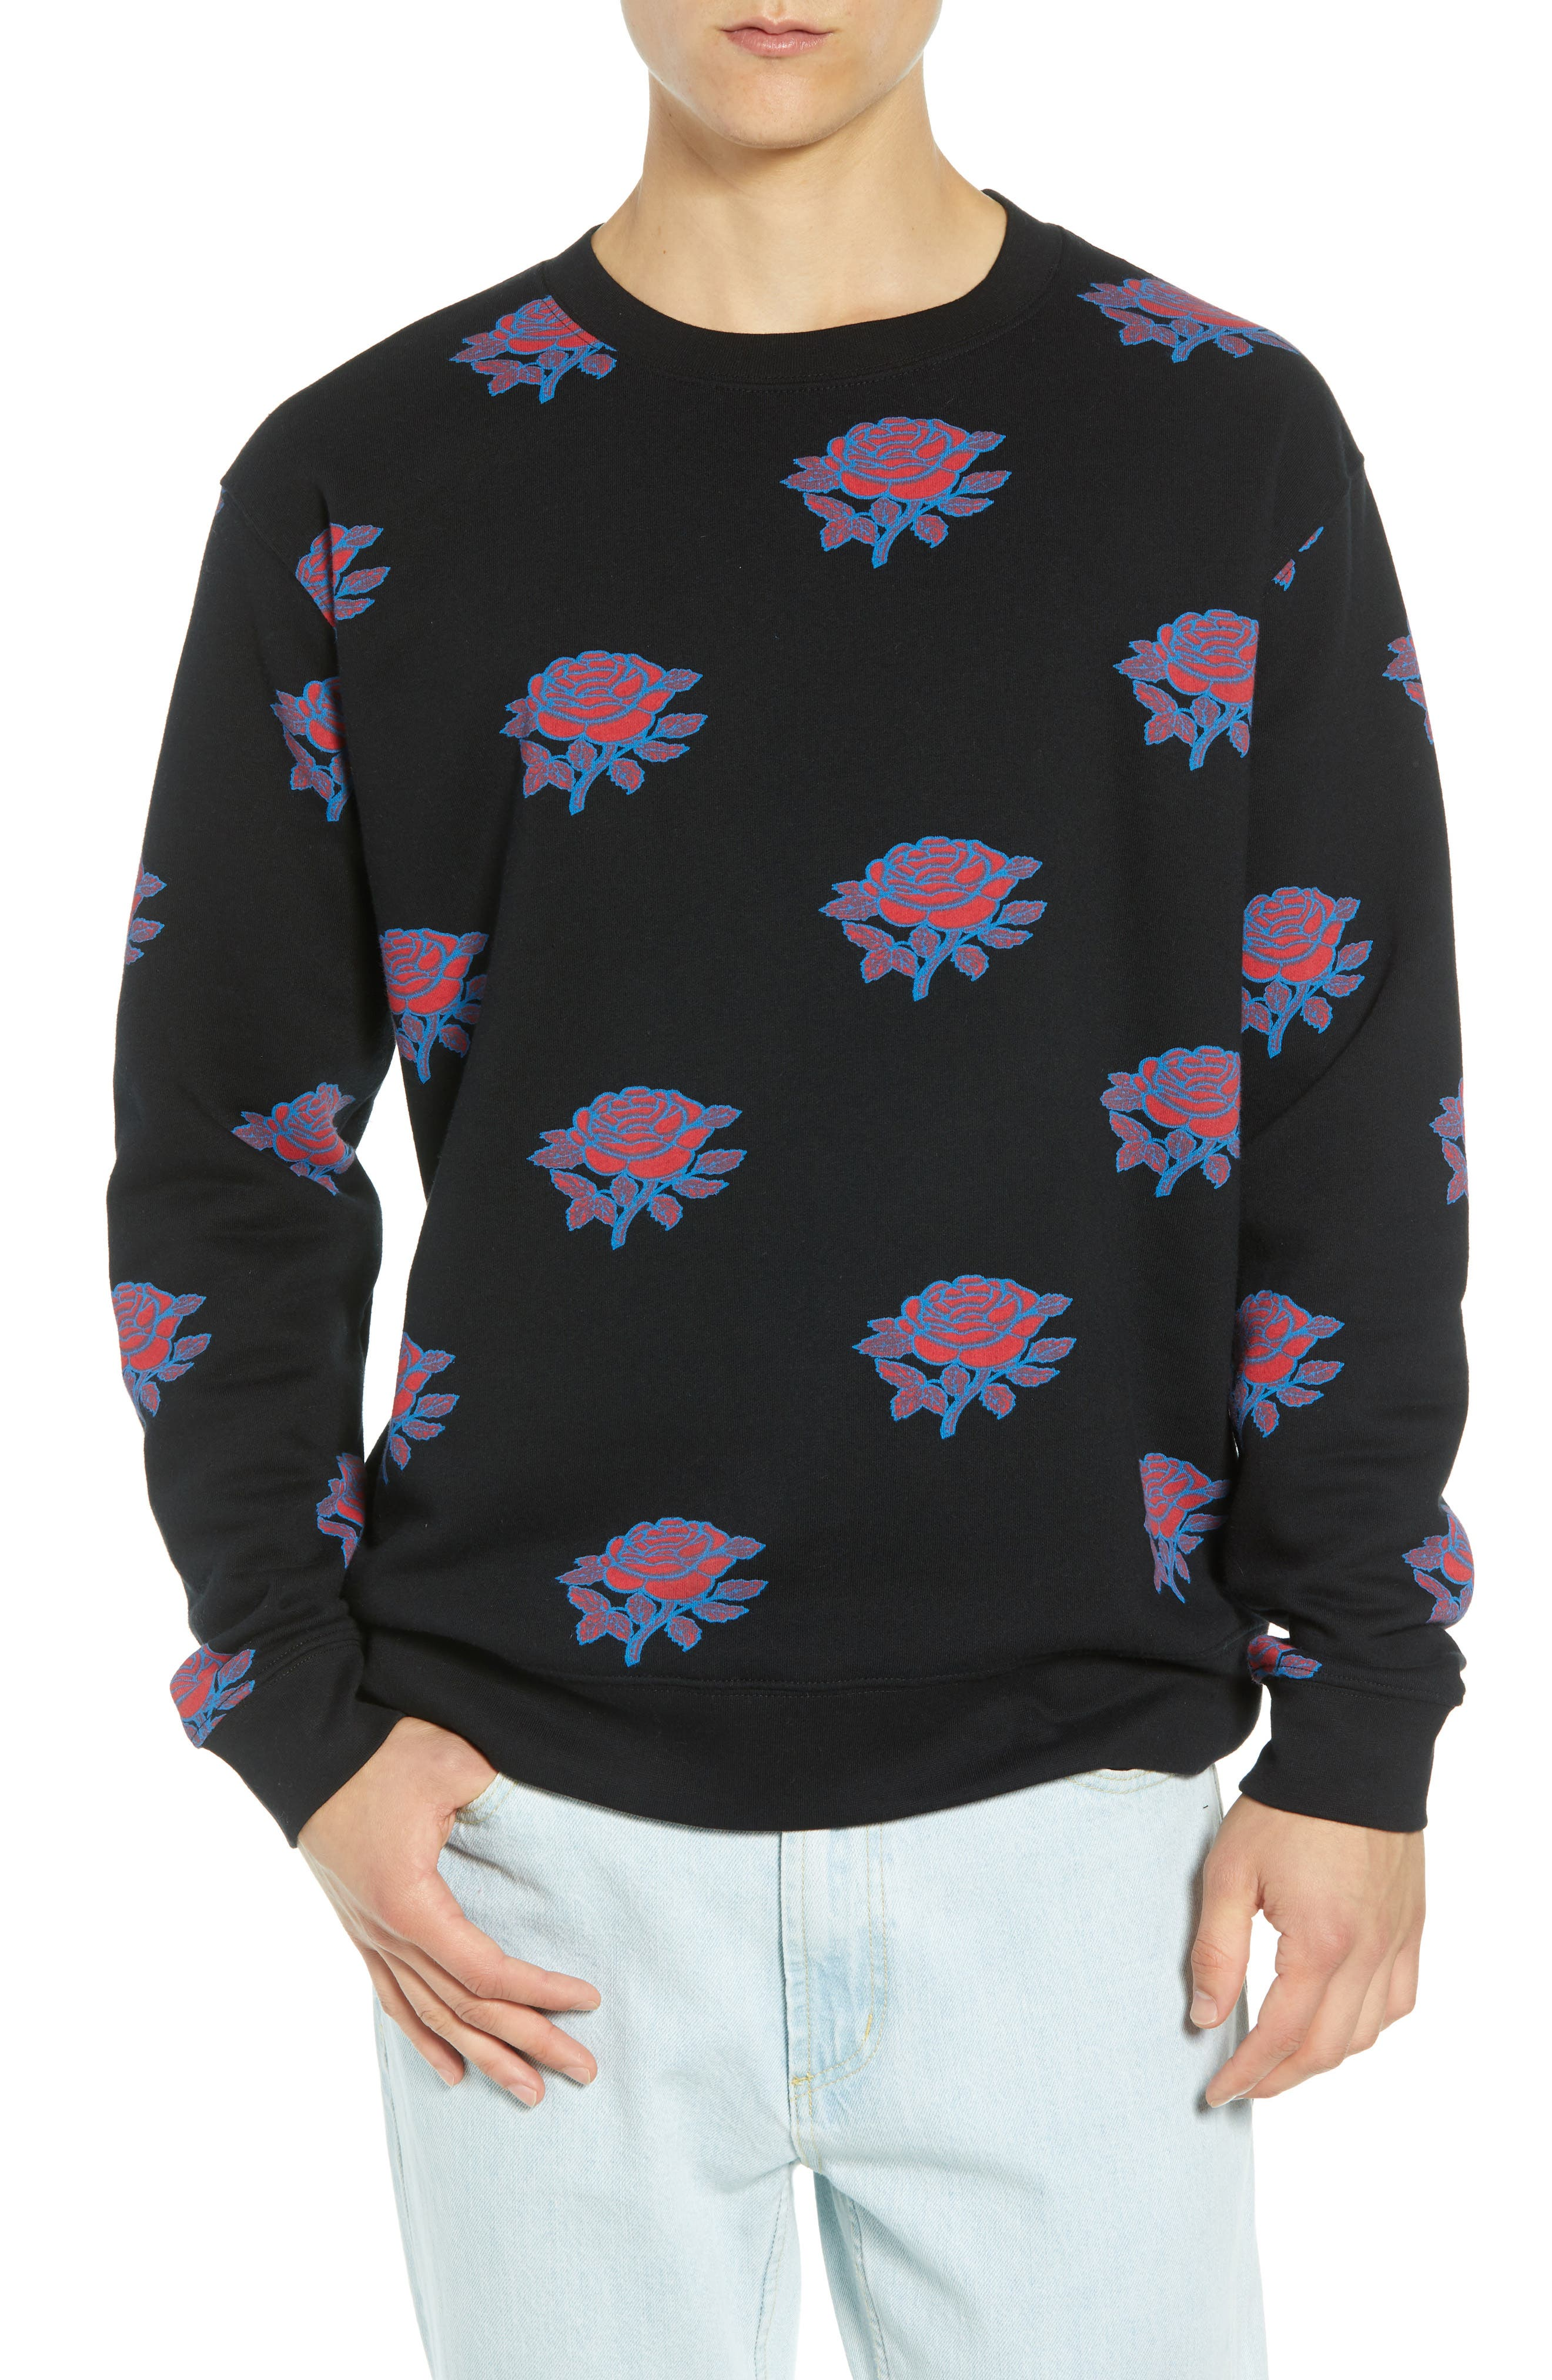 Thorns Crewneck Sweatshirt,                         Main,                         color, BLACK